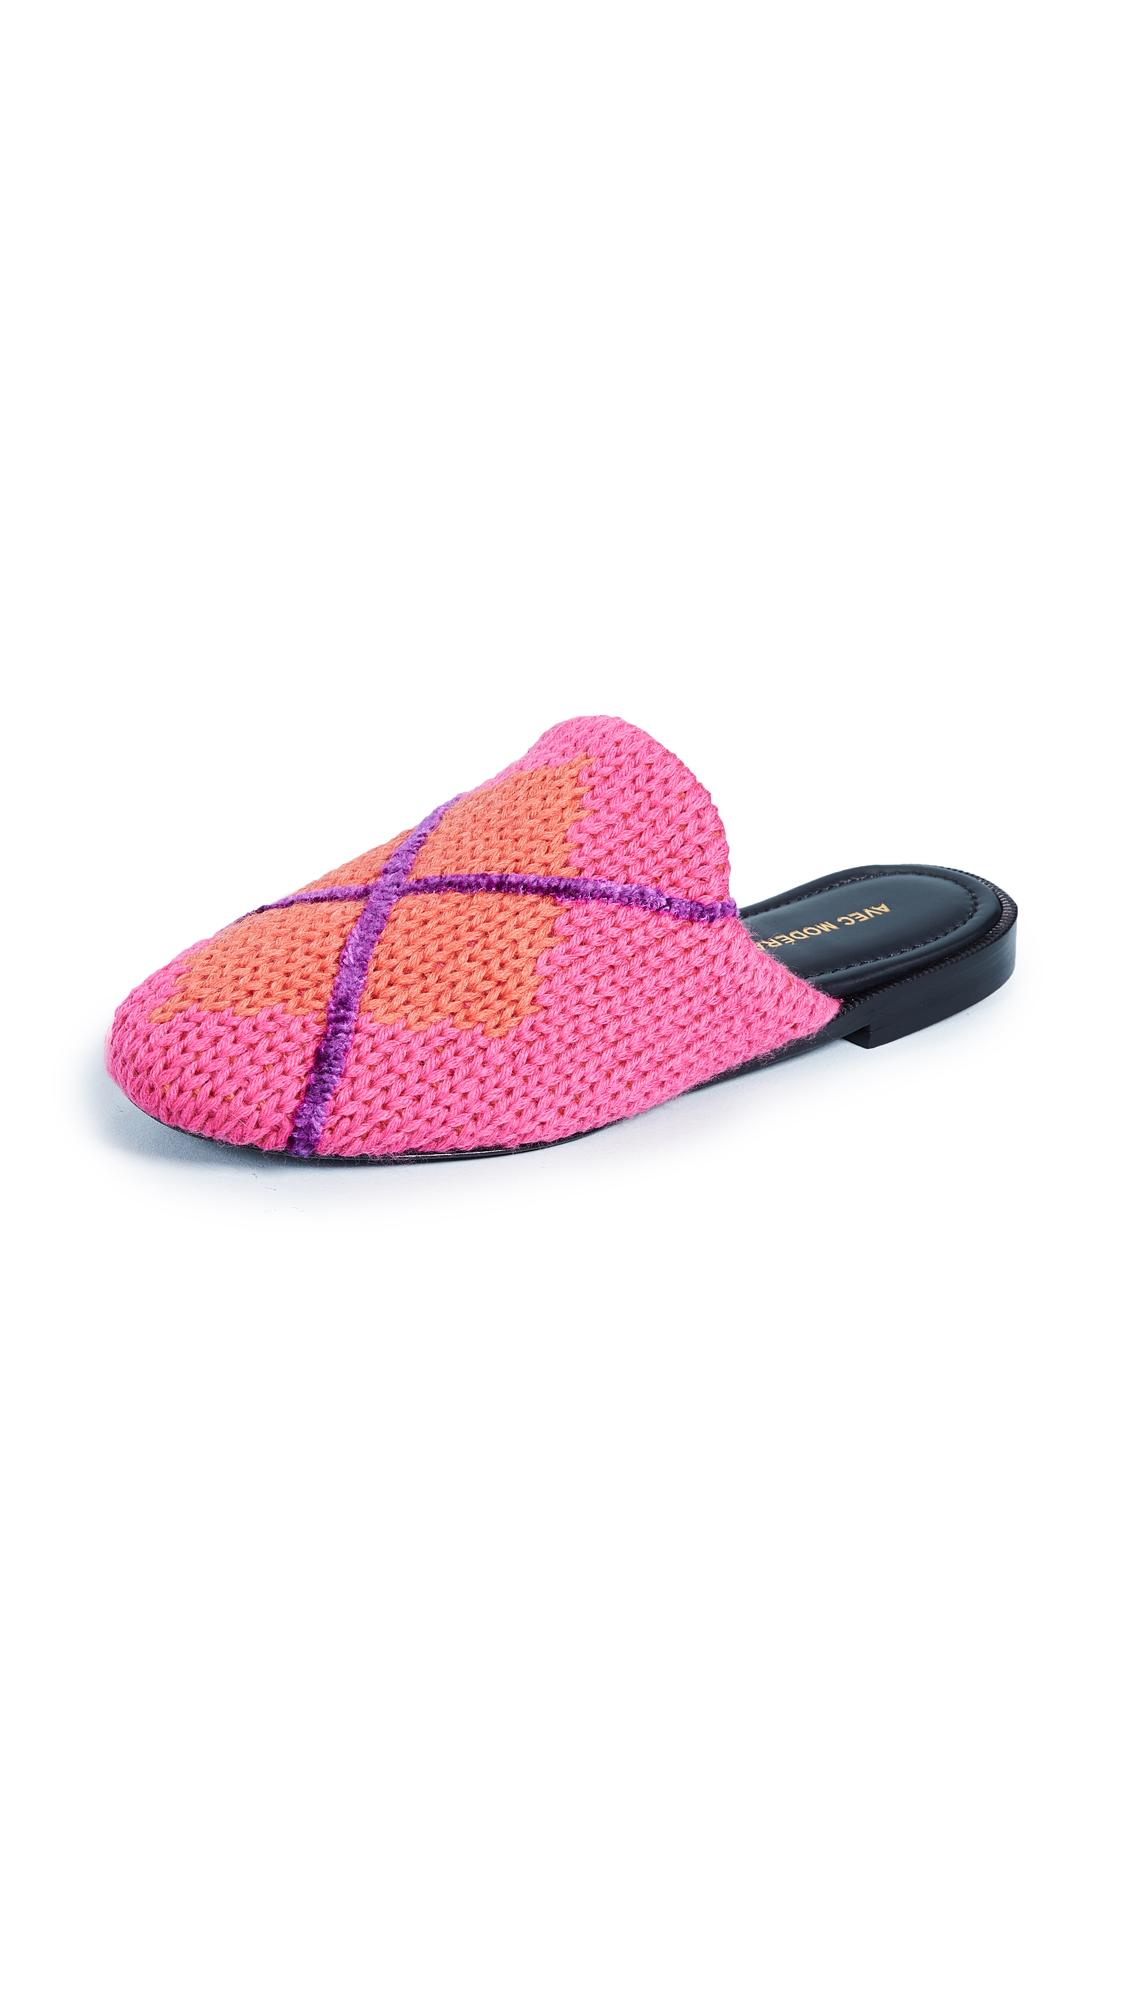 Avec Moderation Zermatt Argyle Slides - Pink